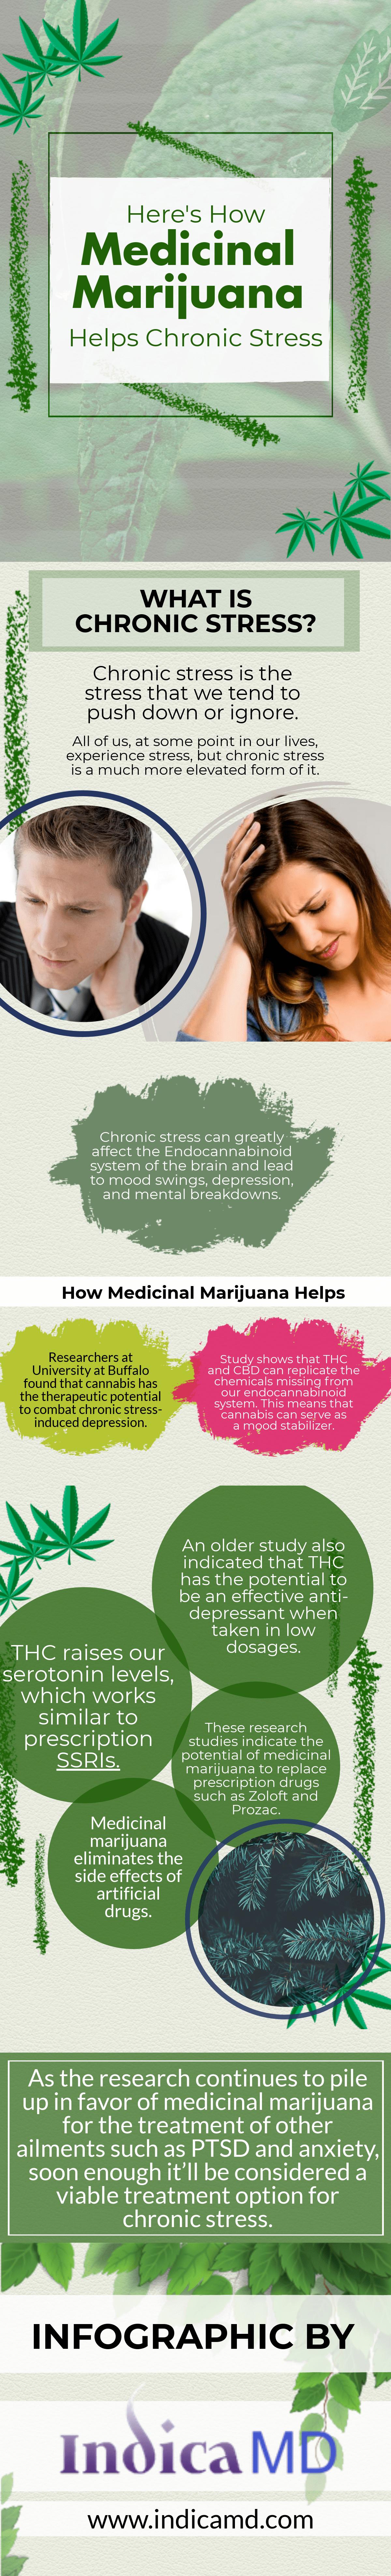 Medical Marijuana Helps Chronic Stress